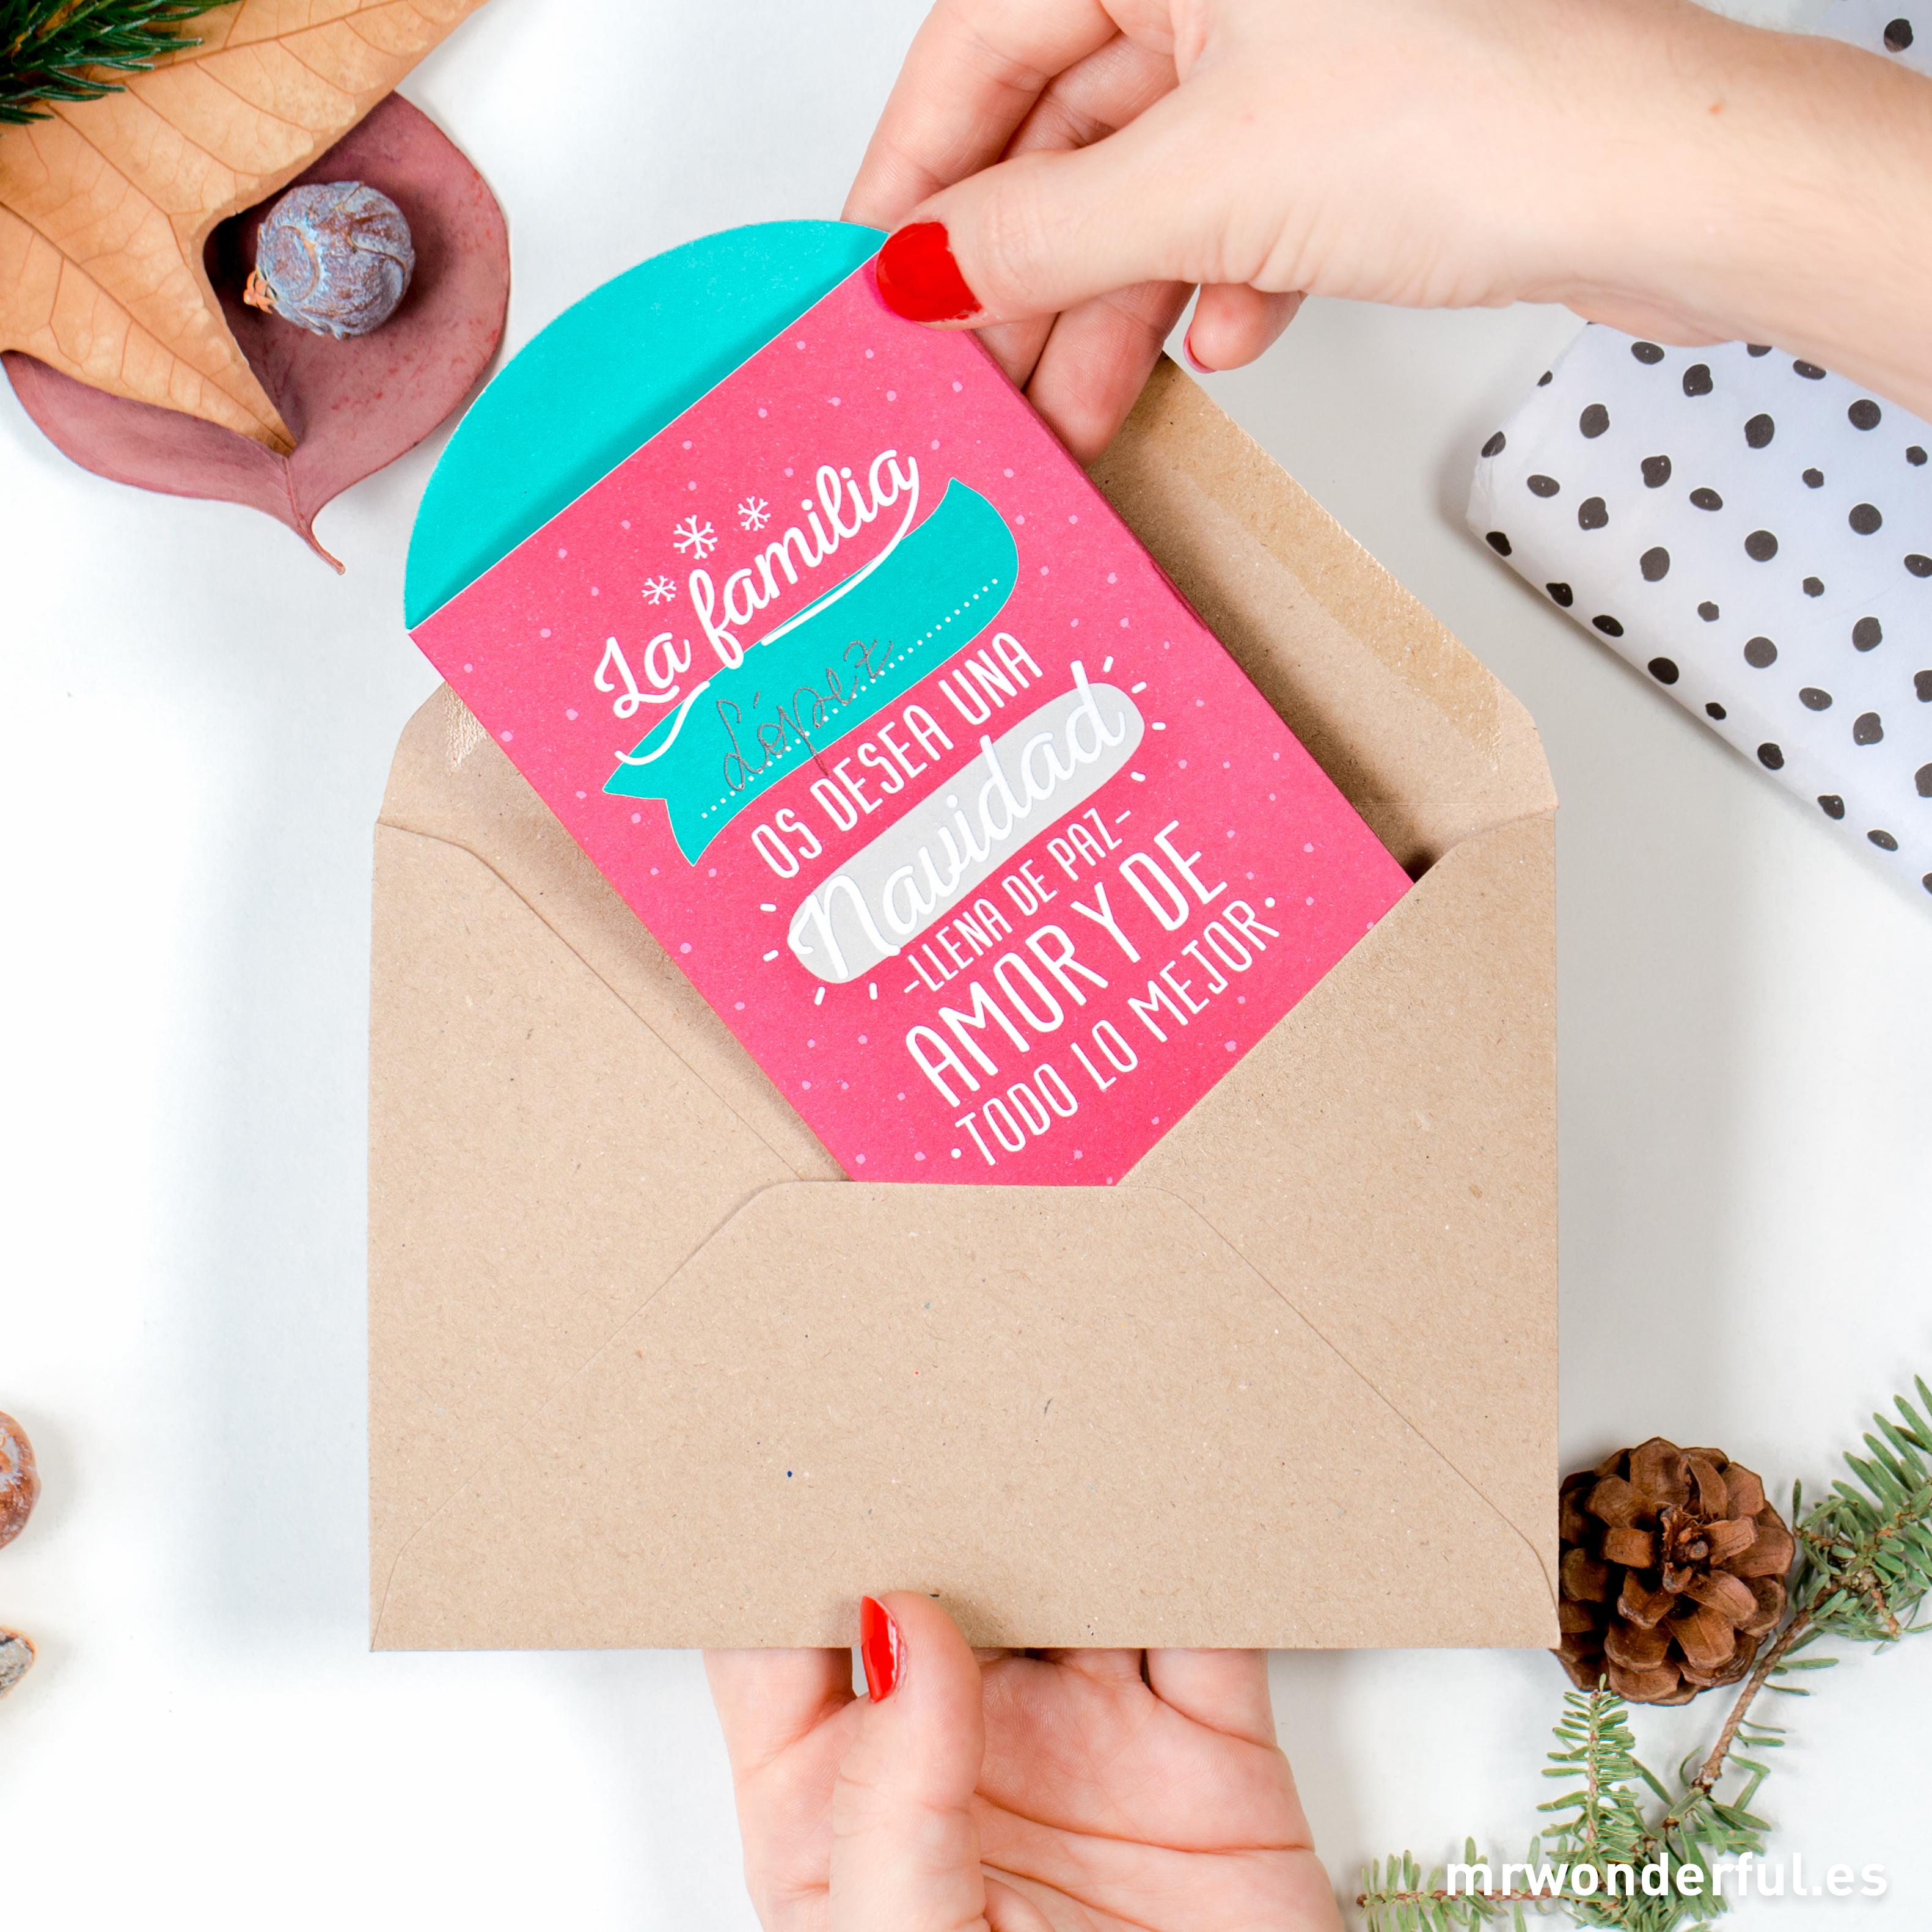 Mr.Wonderful tarjeta benéfica navidad 2015